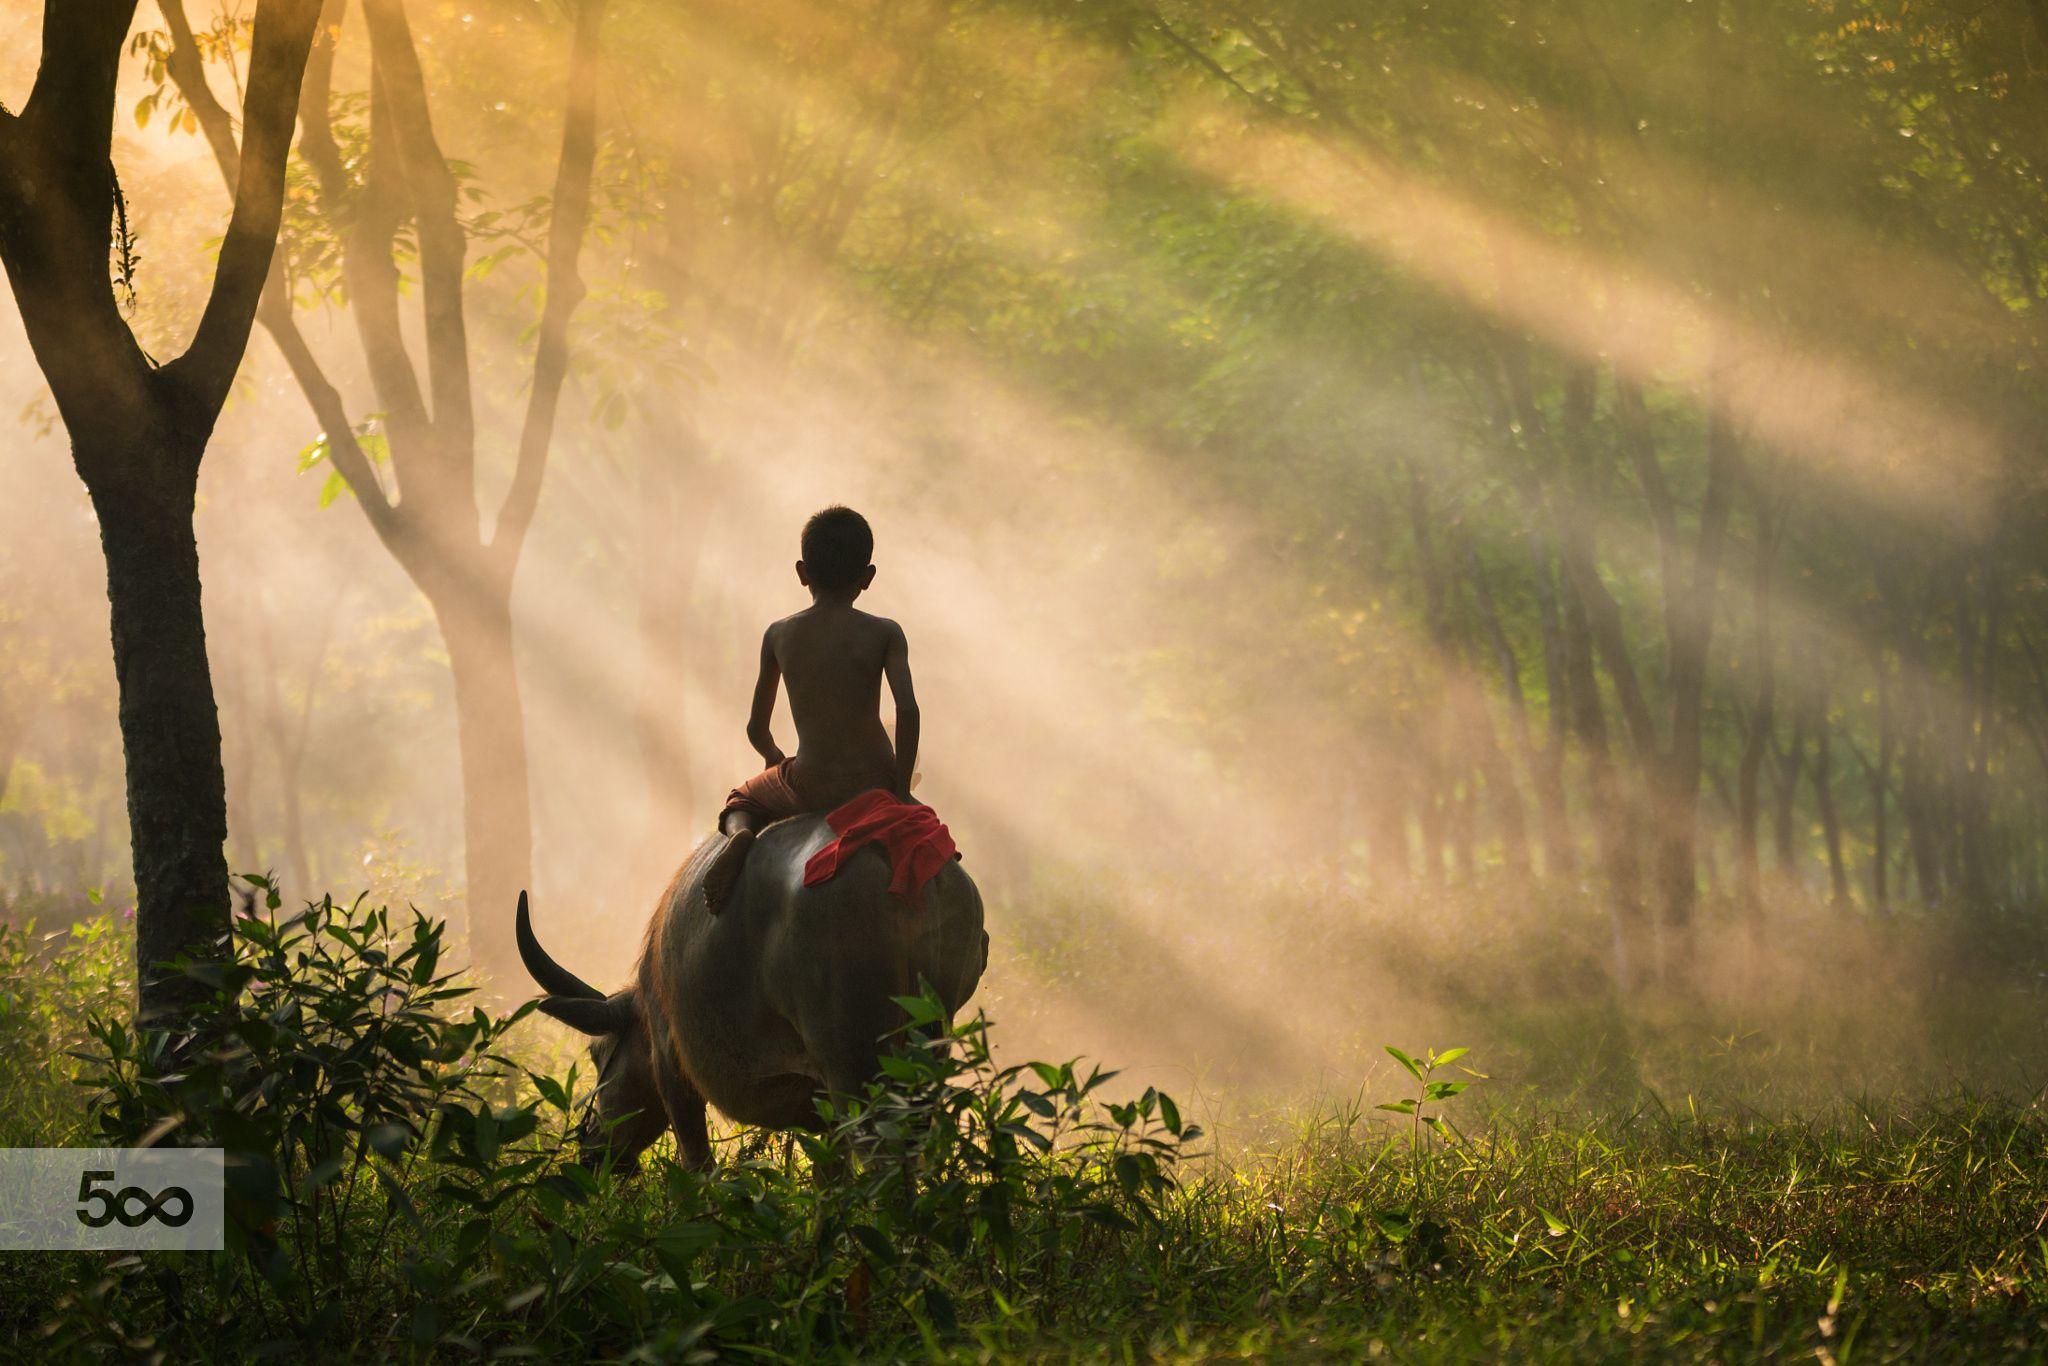 Foggy Morning by Mohd Firdaus Zulkefili / 500px